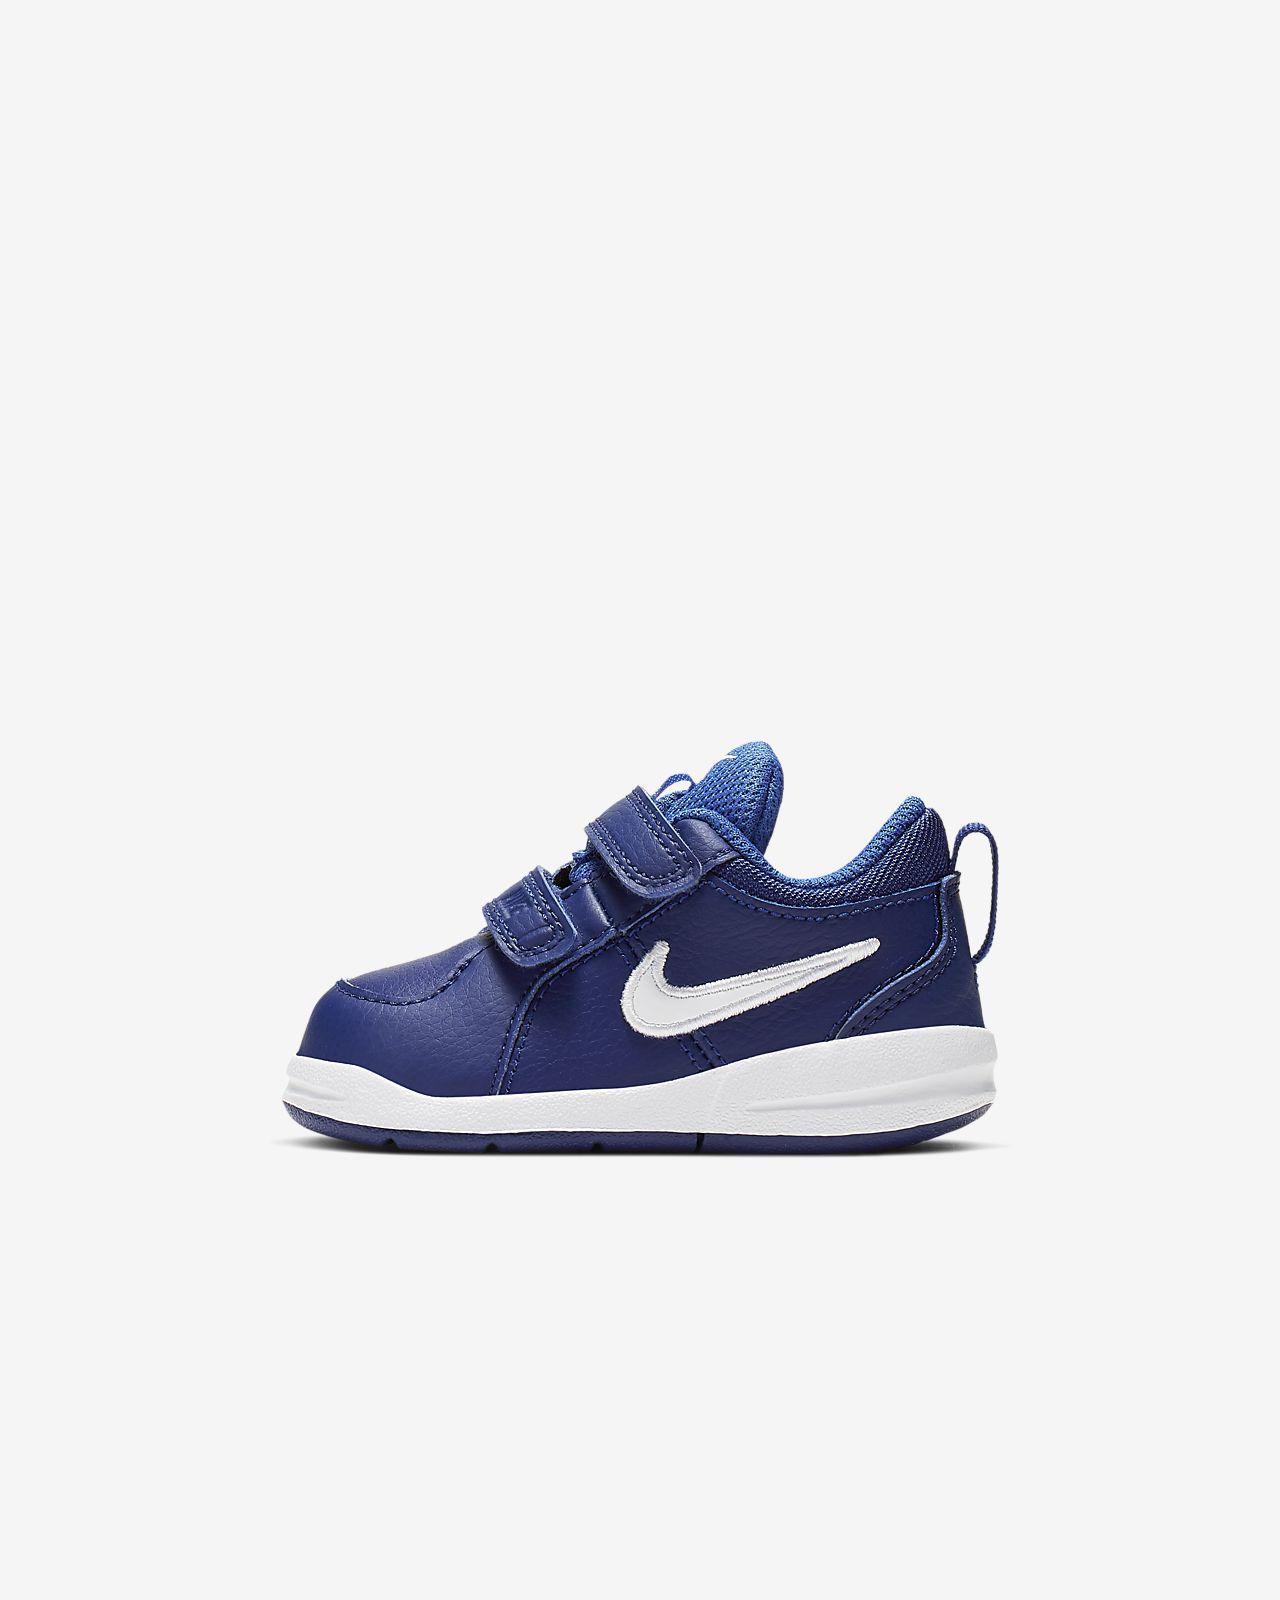 07c0ca01a Nike Pico 4 Zapatillas - Bebé e infantil. Nike.com ES